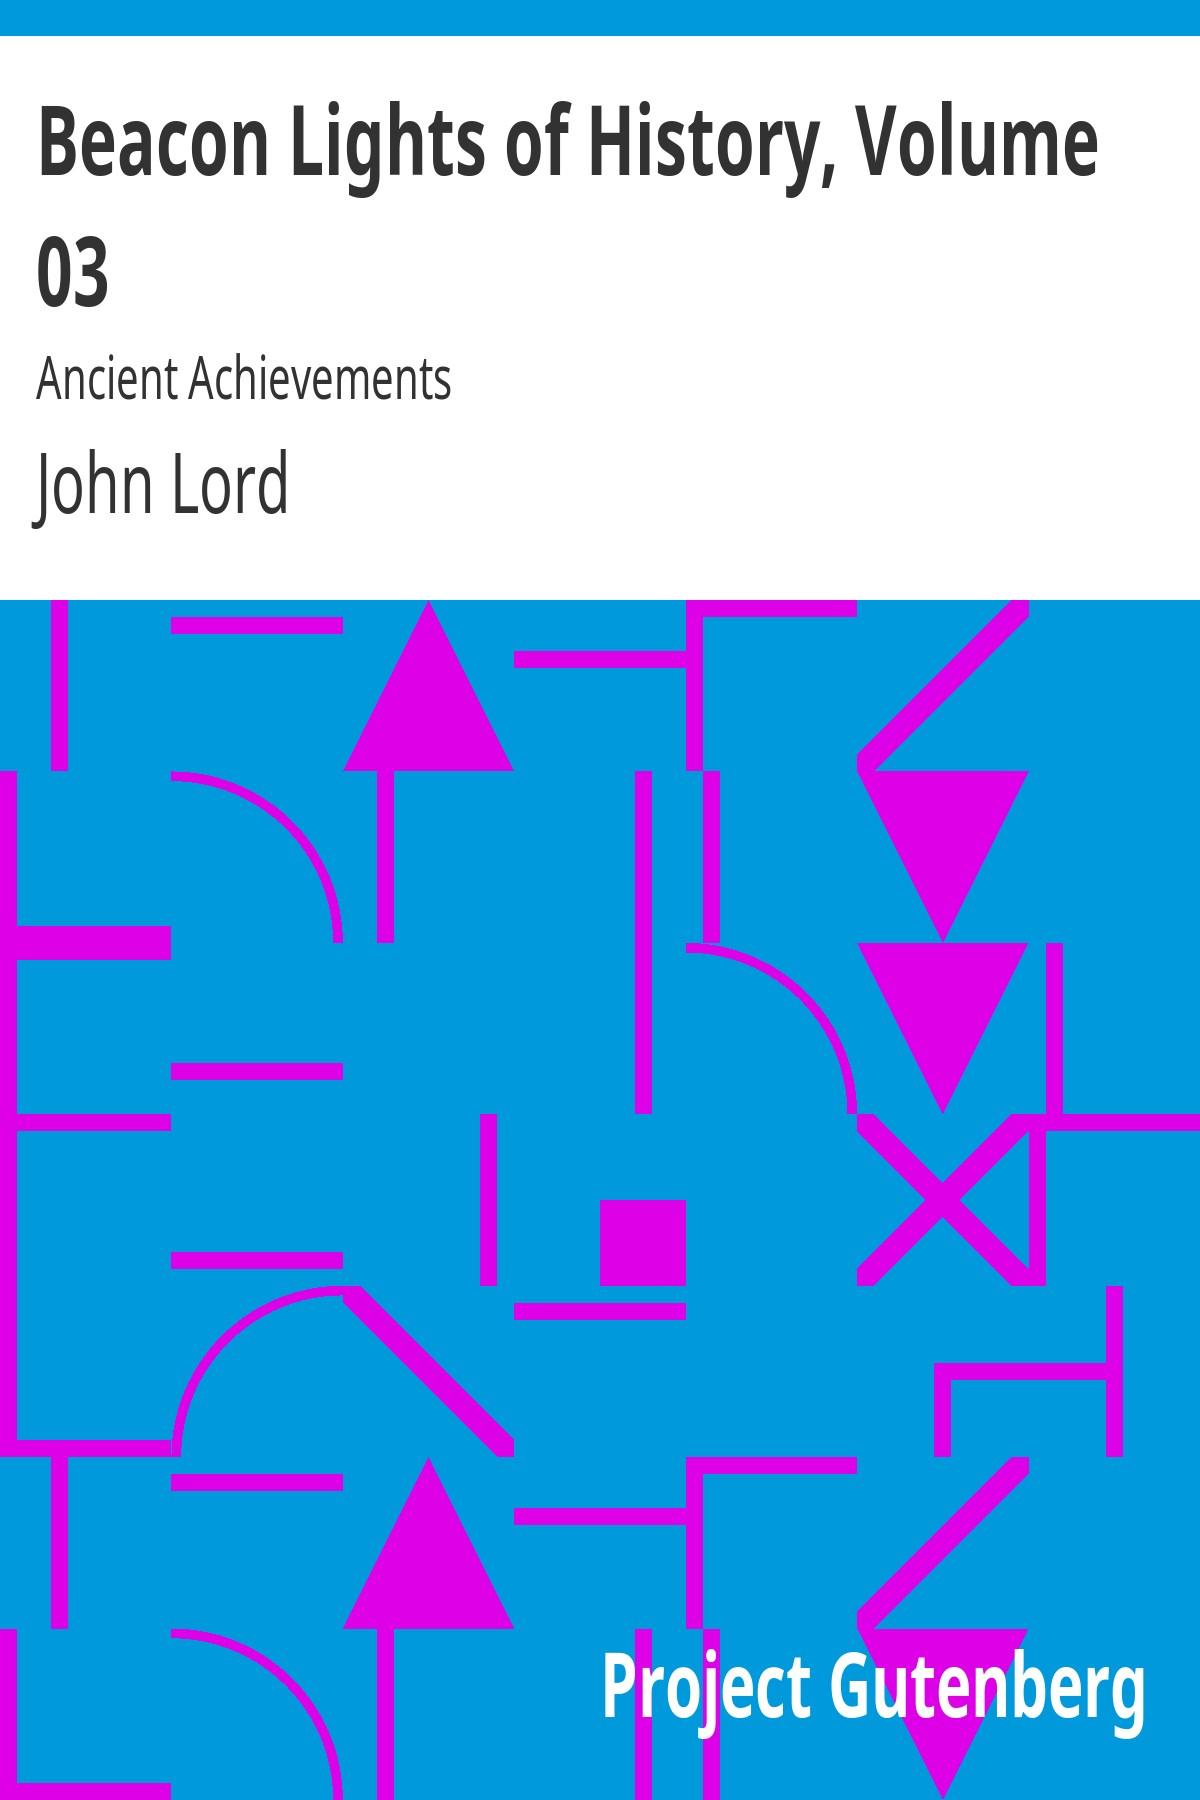 John Lord Beacon Lights of History, Volume 03: Ancient Achievements